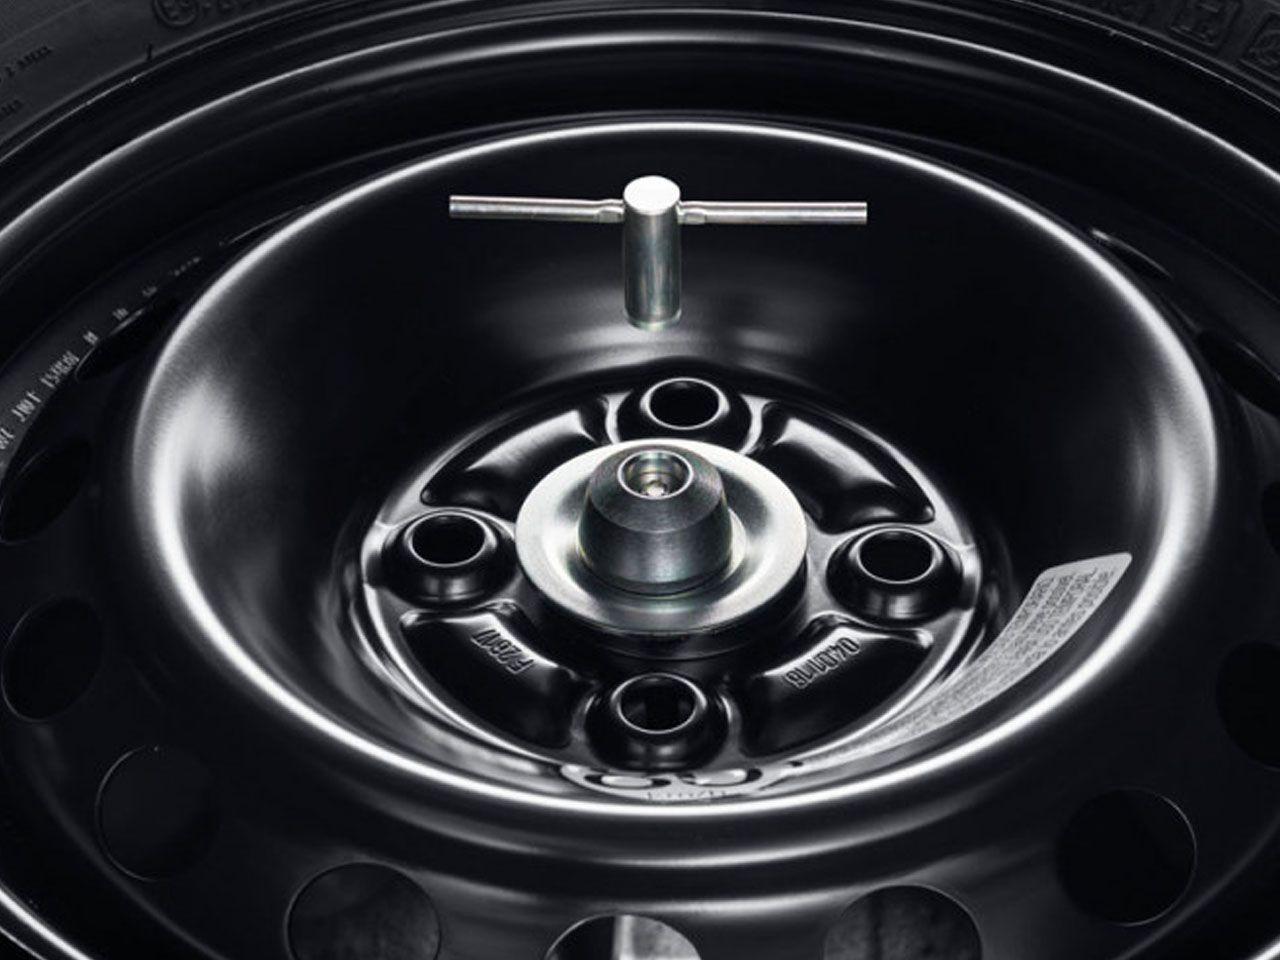 Trava de Segurança do Estepe Yaris Hatch XL XS XLS  - Mirai Peças Toyota